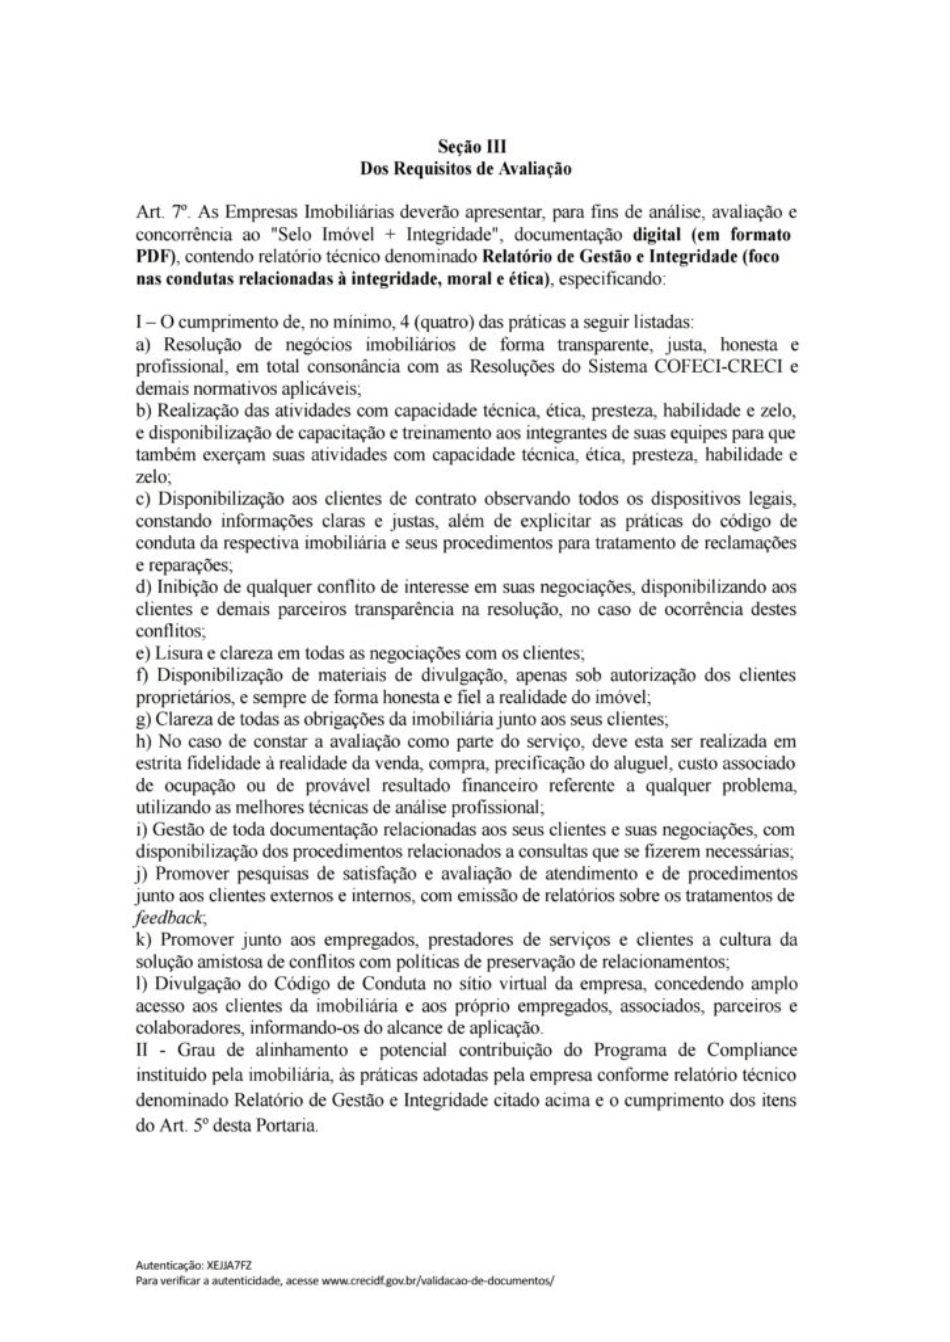 PORTARIA Nº 58 - SELO IMÓVEL + INTEGRIDADE.pdf_page_04